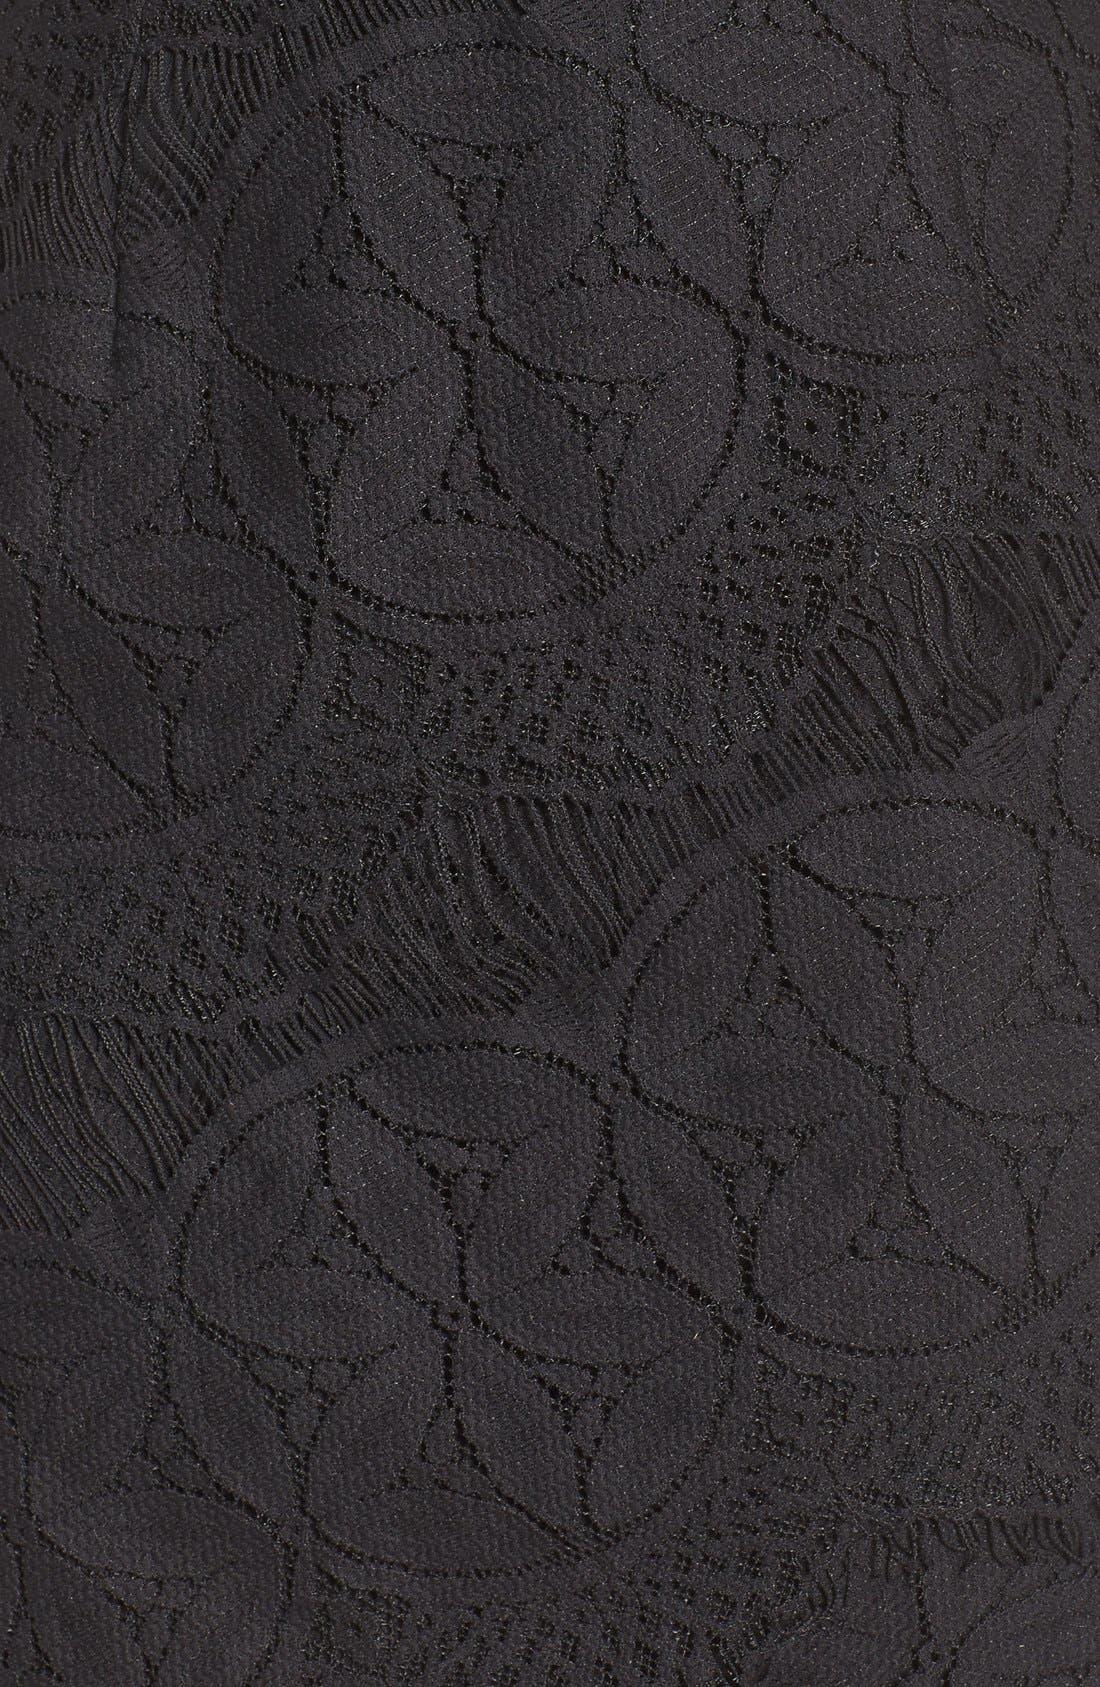 Lace High/Low Sheath Dress,                             Alternate thumbnail 20, color,